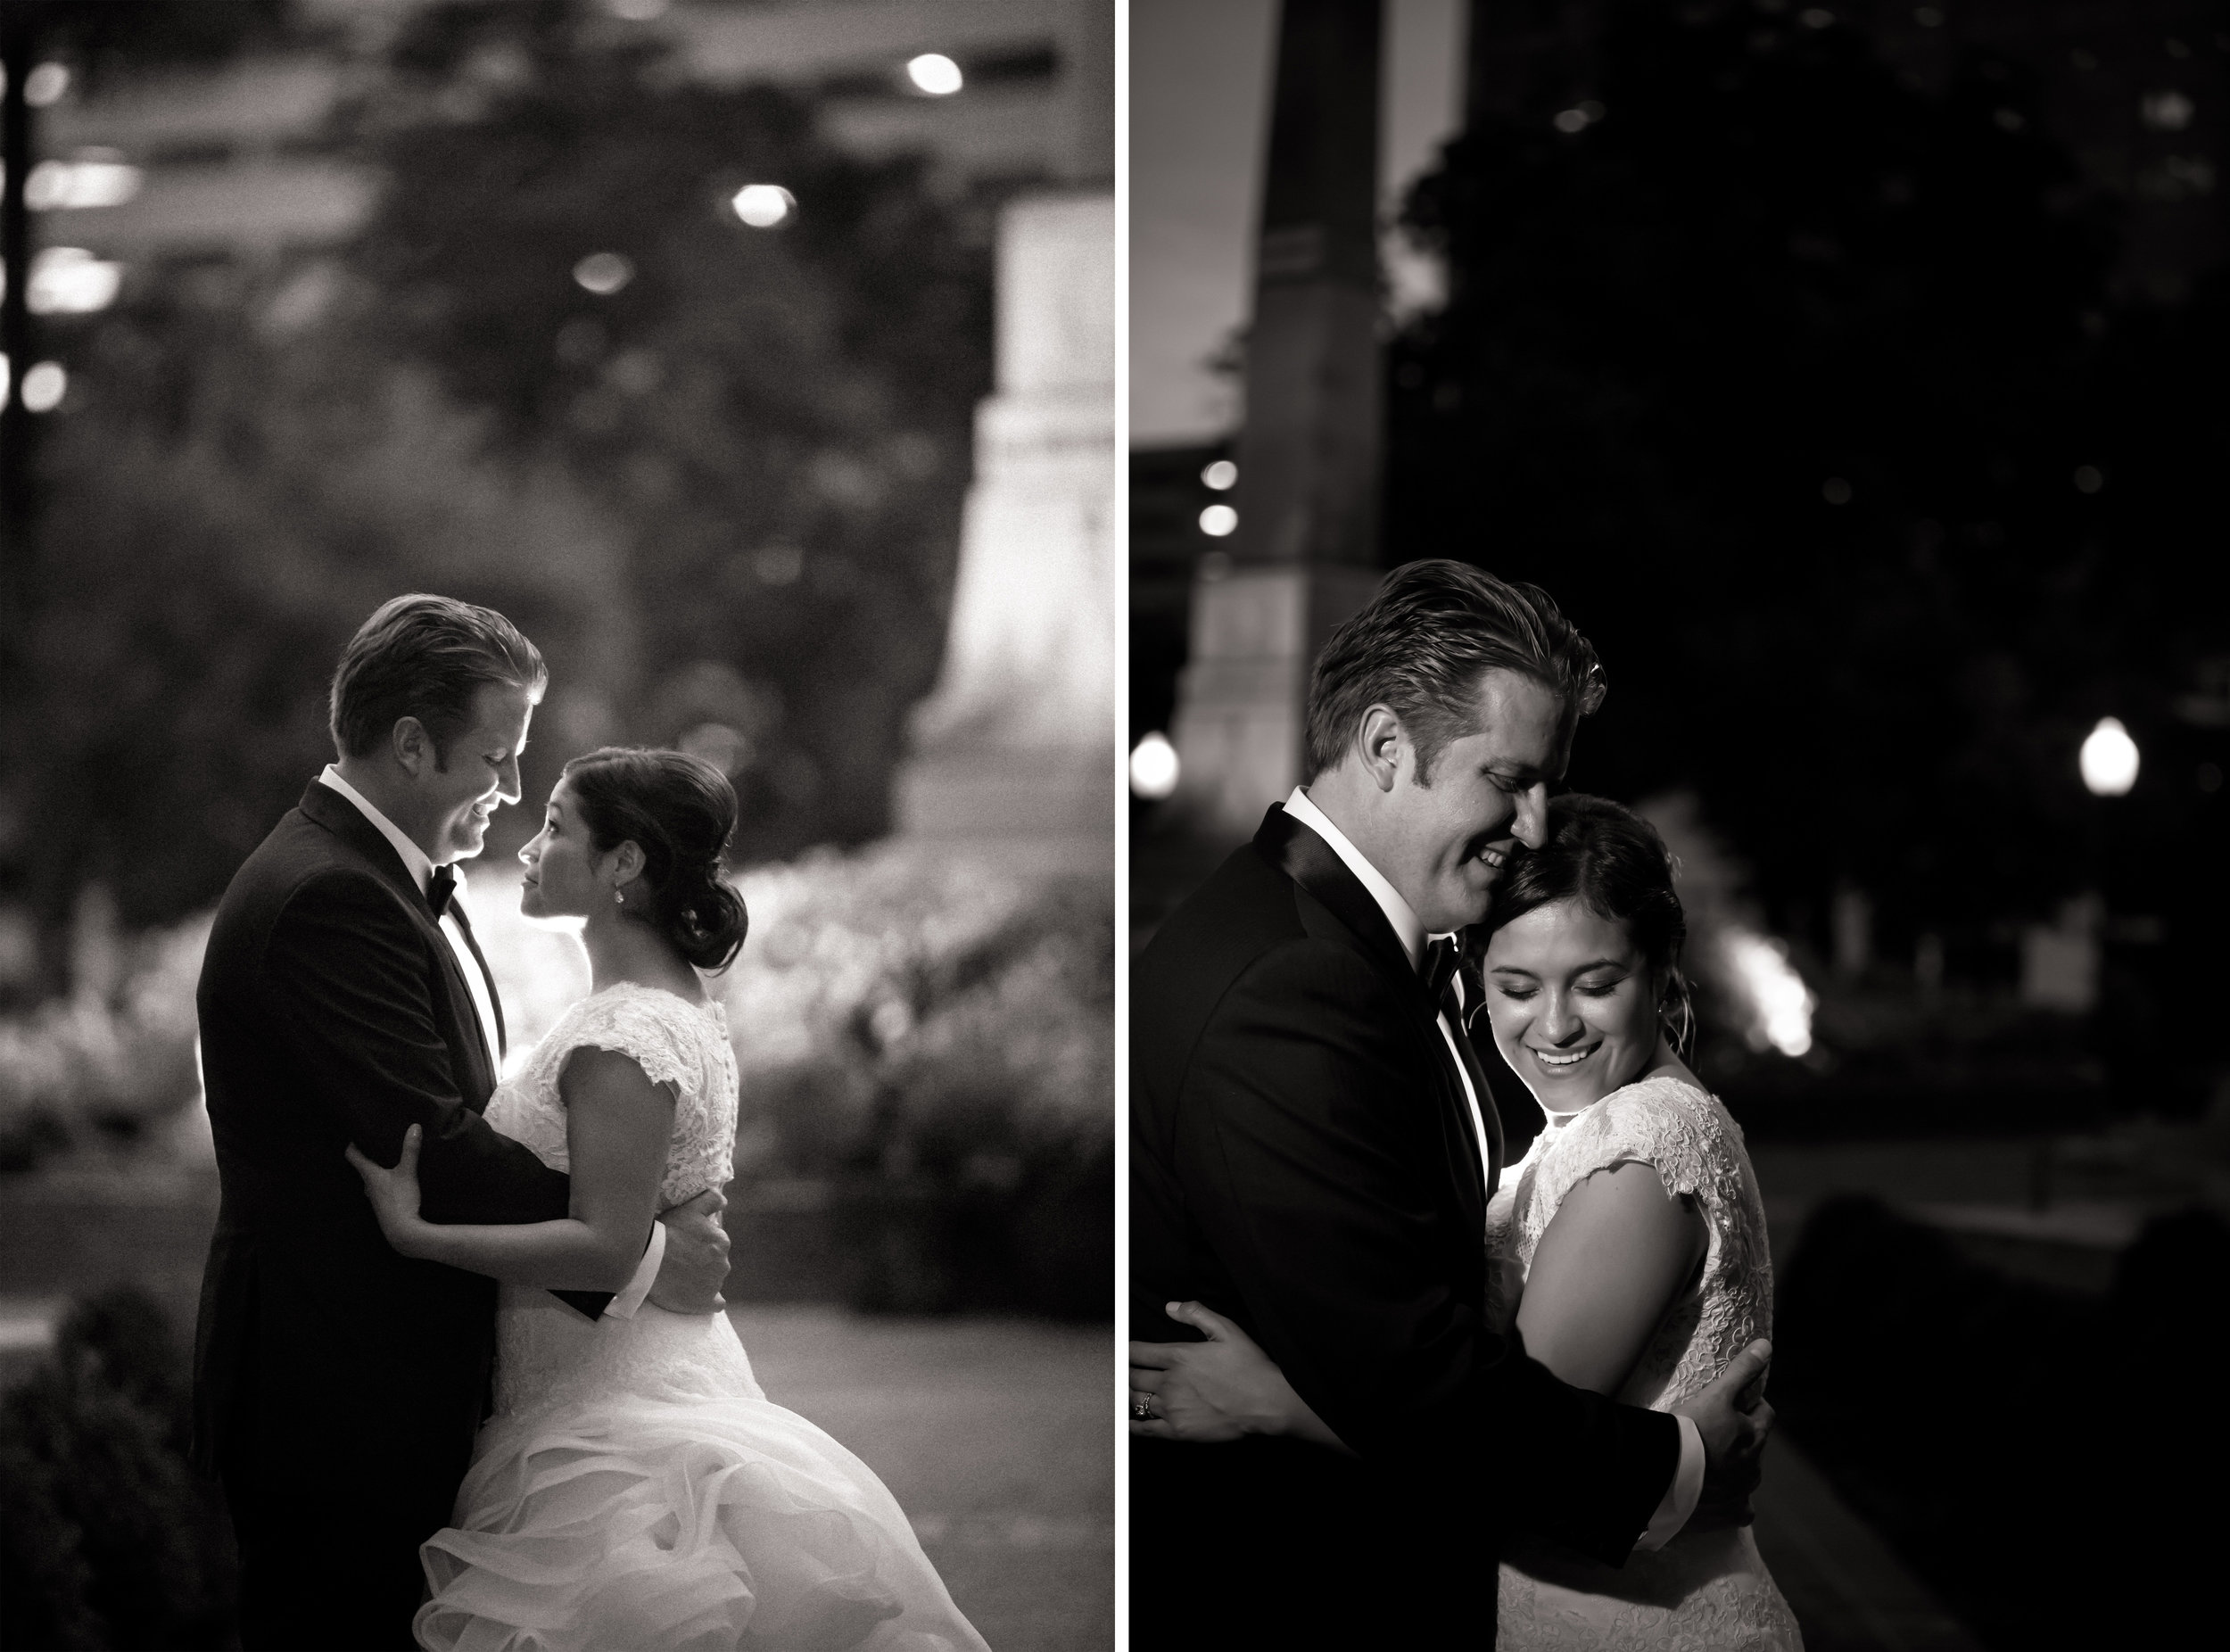 Marble_Falls_Horseshoe_Bay_Photographer_Torres_Wedding_45.jpg